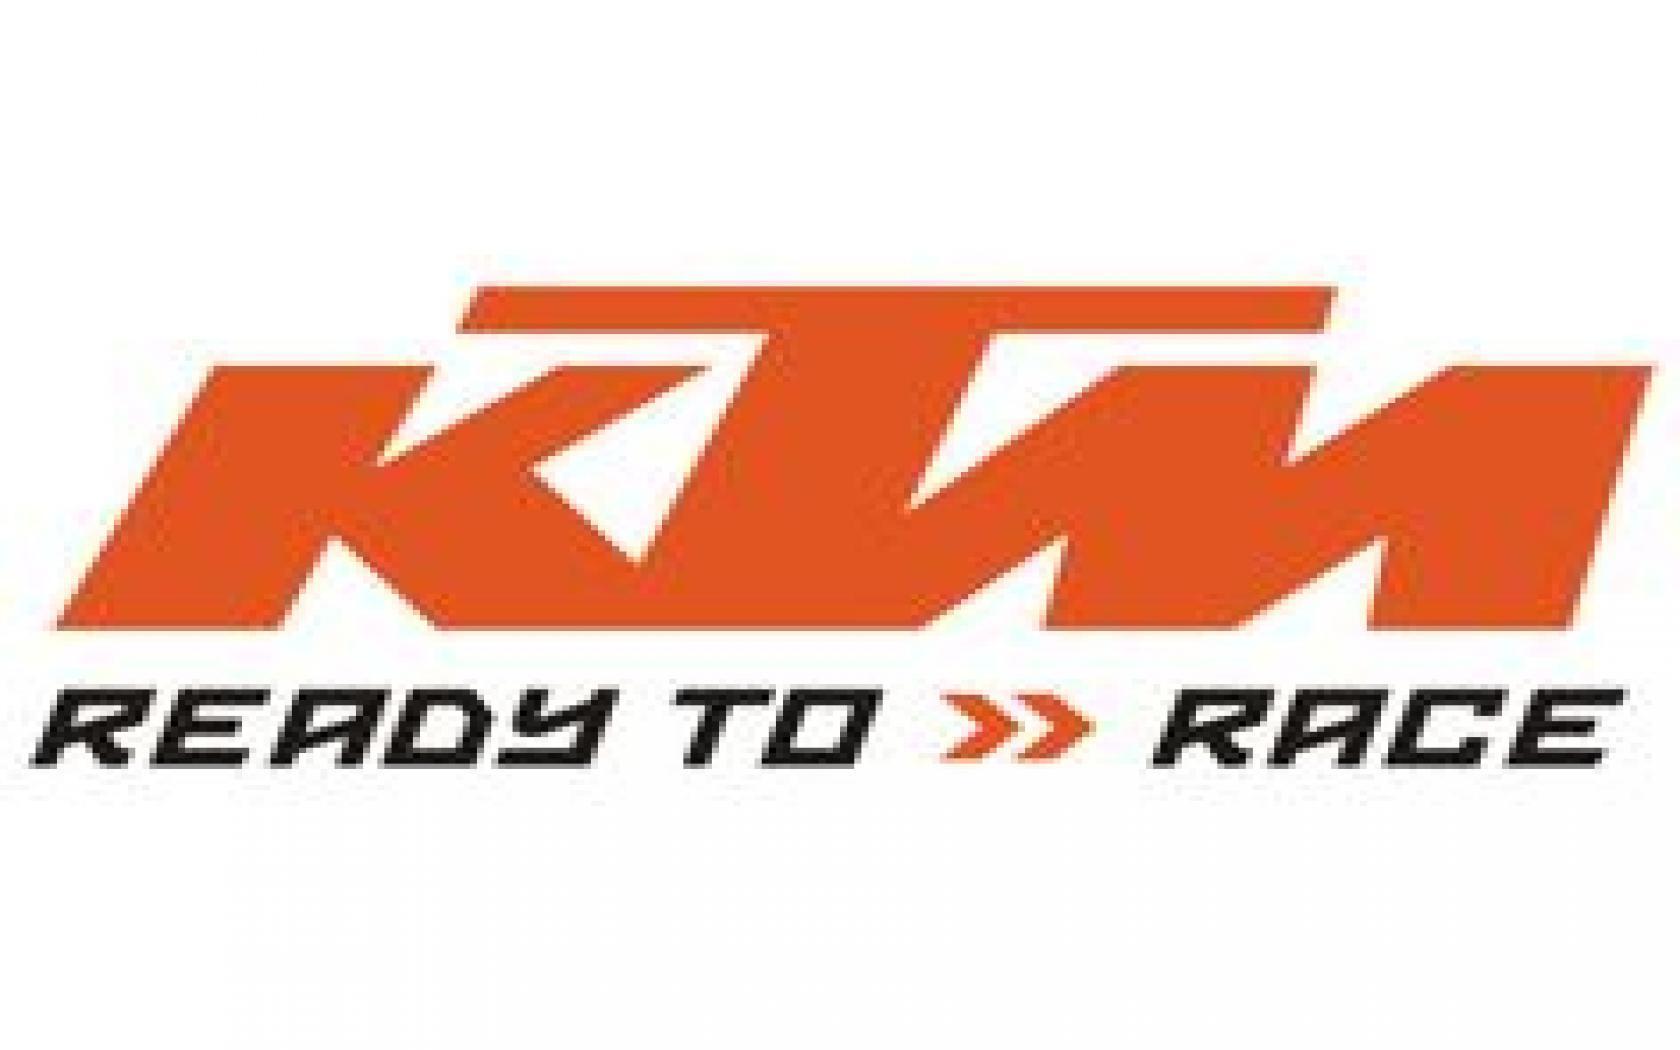 Ktm Logo Wallpapers Top Free Ktm Logo Backgrounds Wallpaperaccess Get portrait ktm logo hd wallpaper png